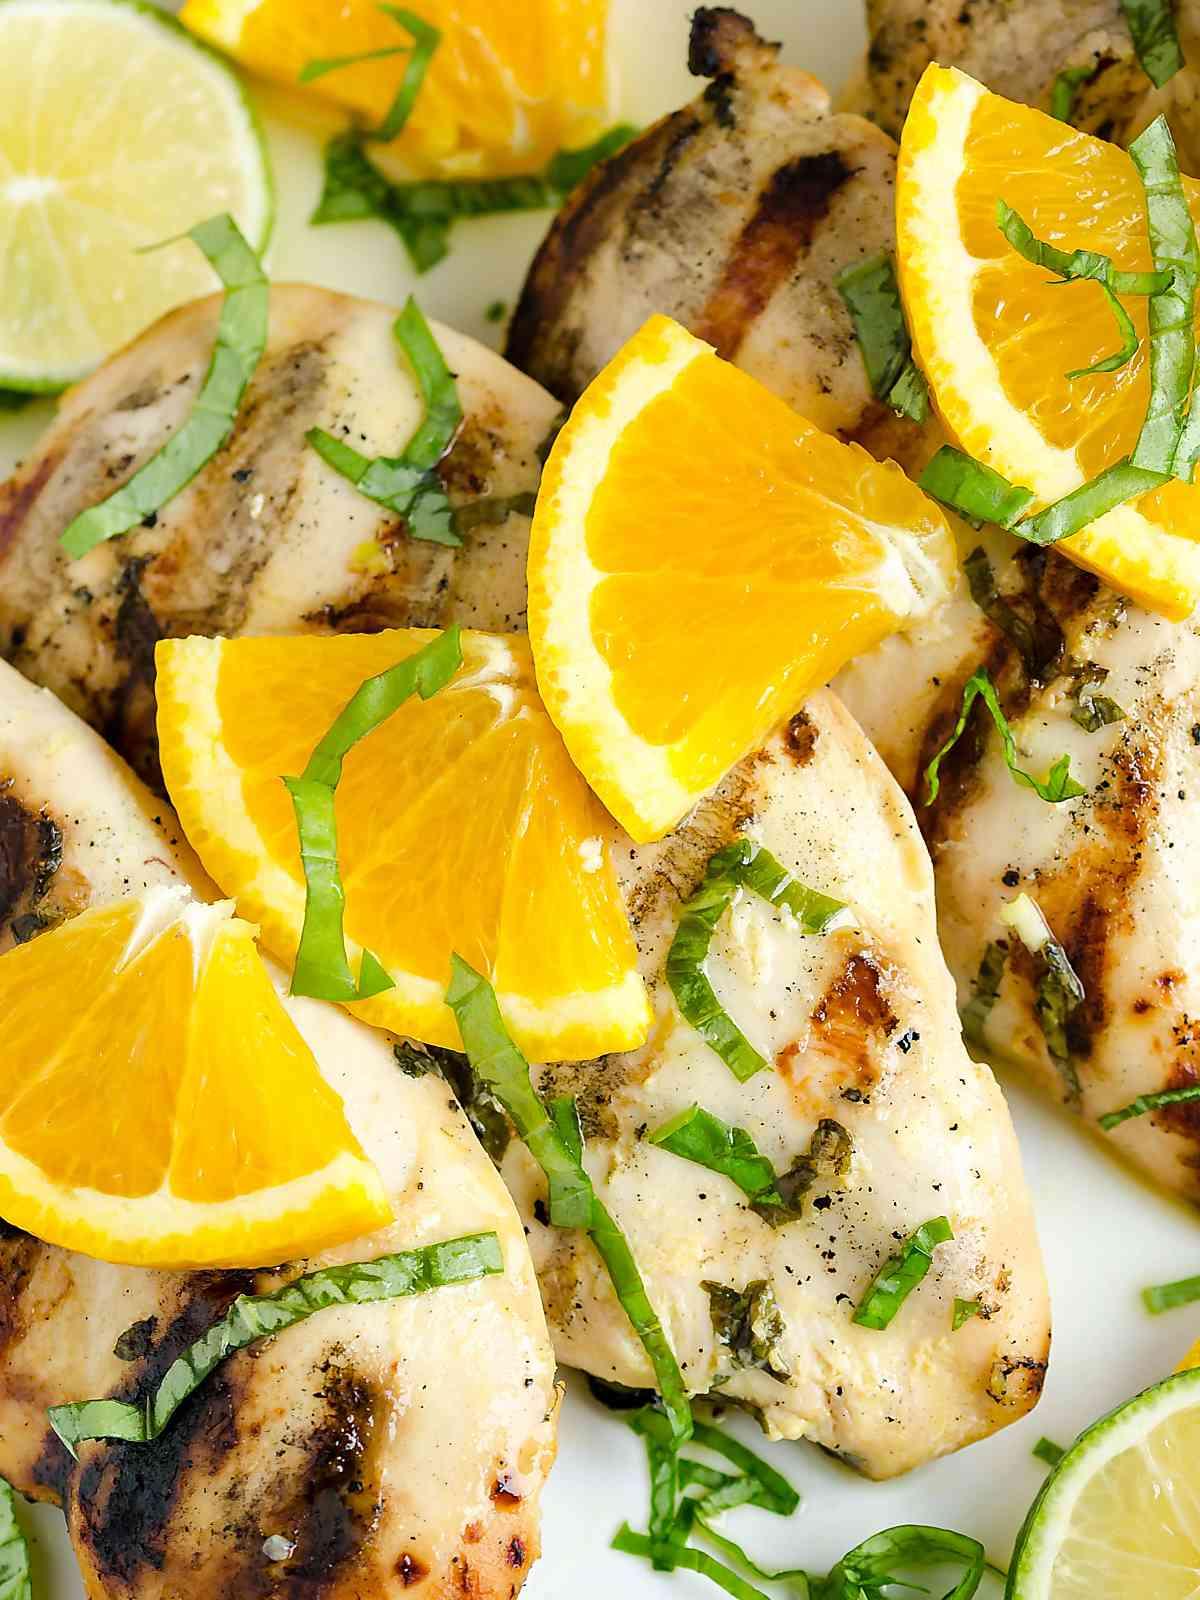 Citrus basil grilled chicken on a serving platter